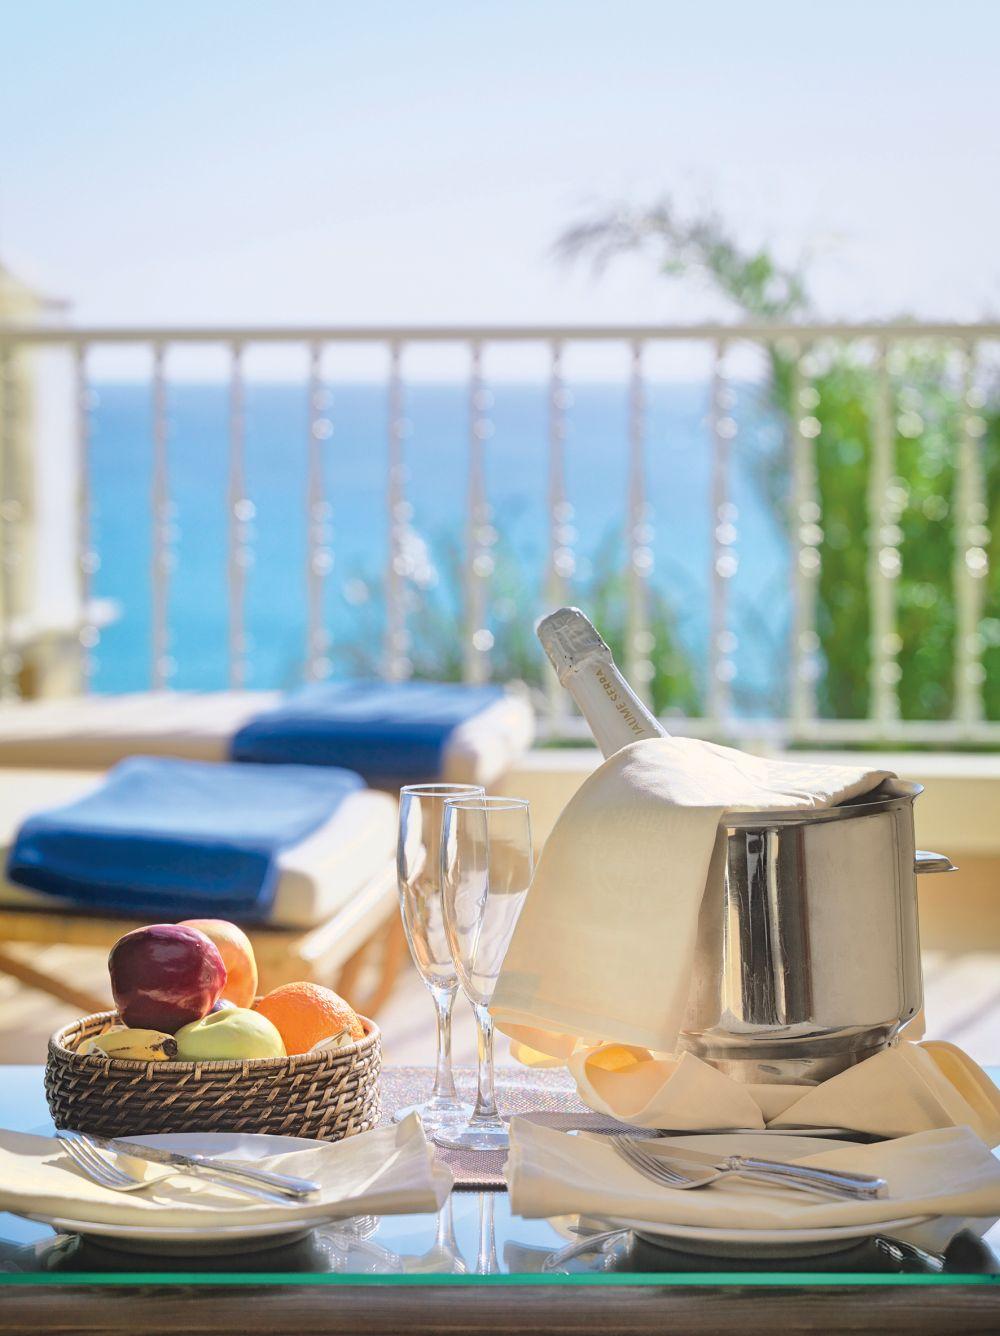 Adrian Hoteles Jardines De Nivaria In Tenerife Vip Selection